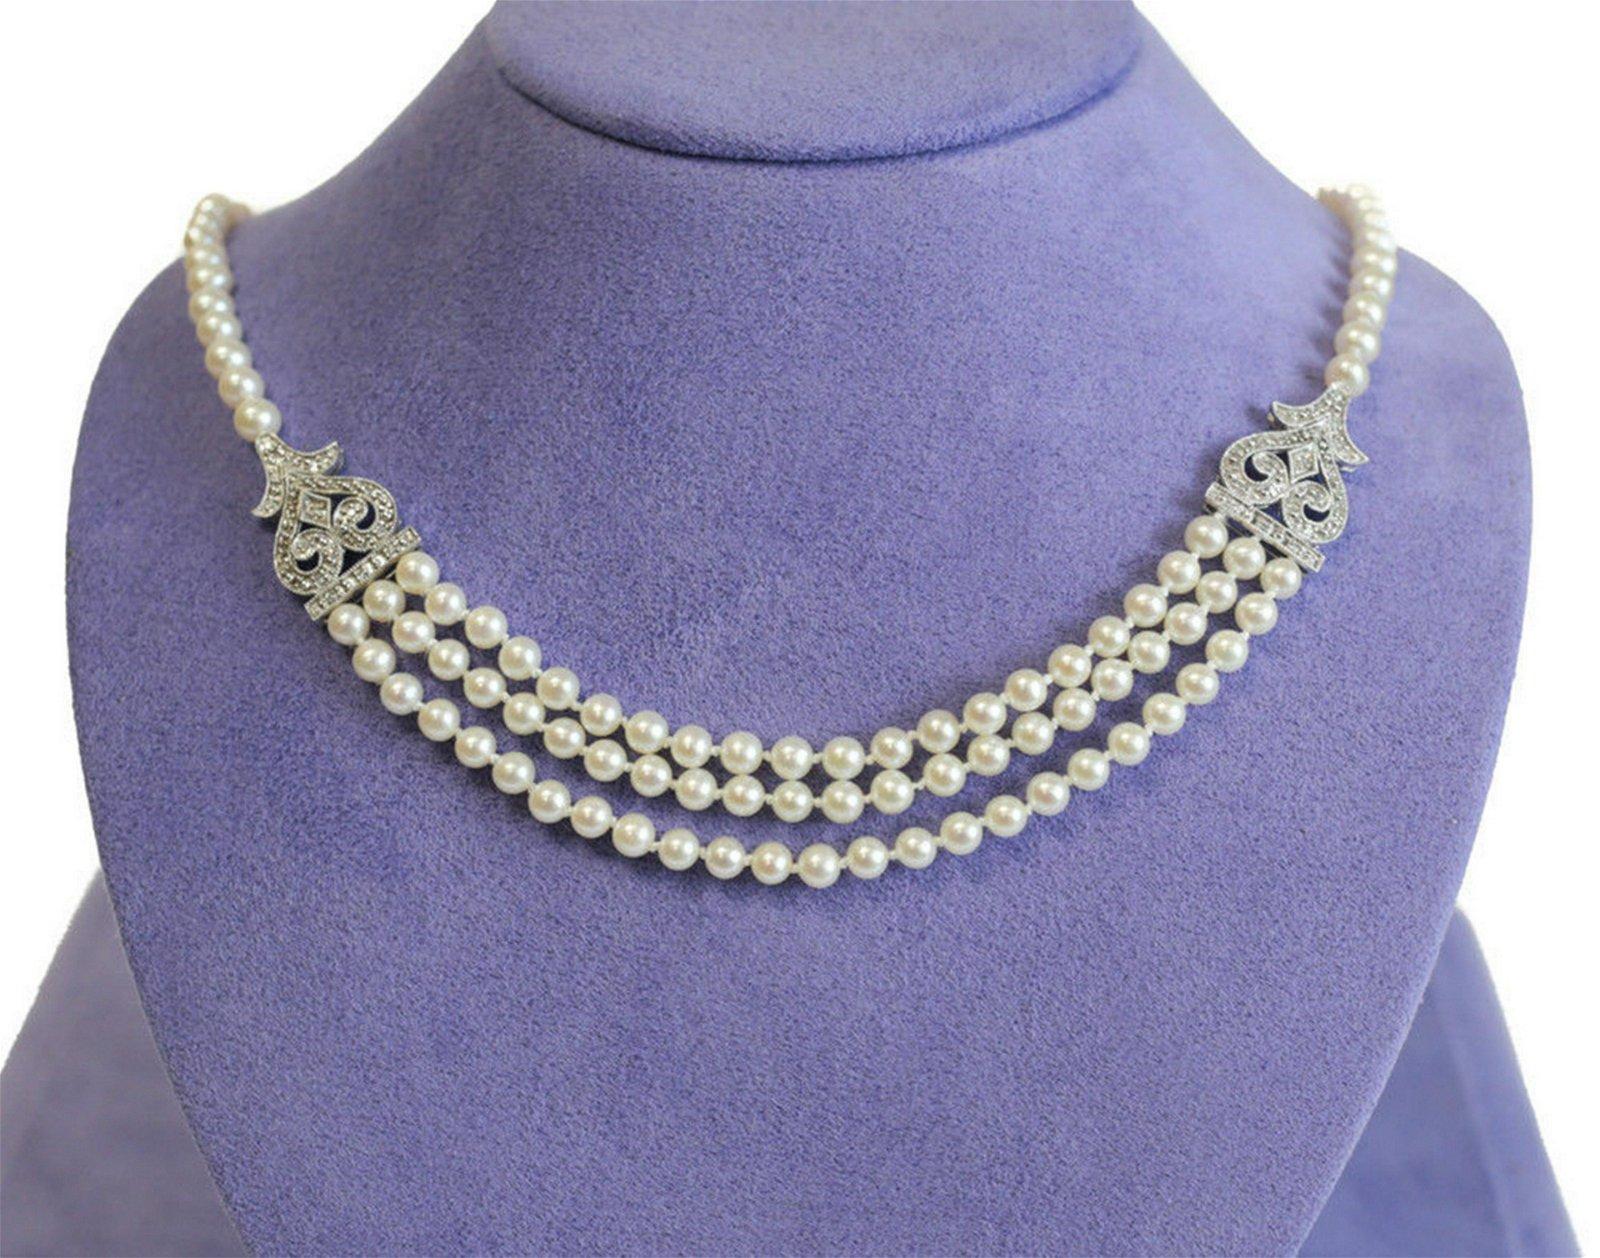 14k White Gold Diamond Cultured Pearl 3 Strand Necklace